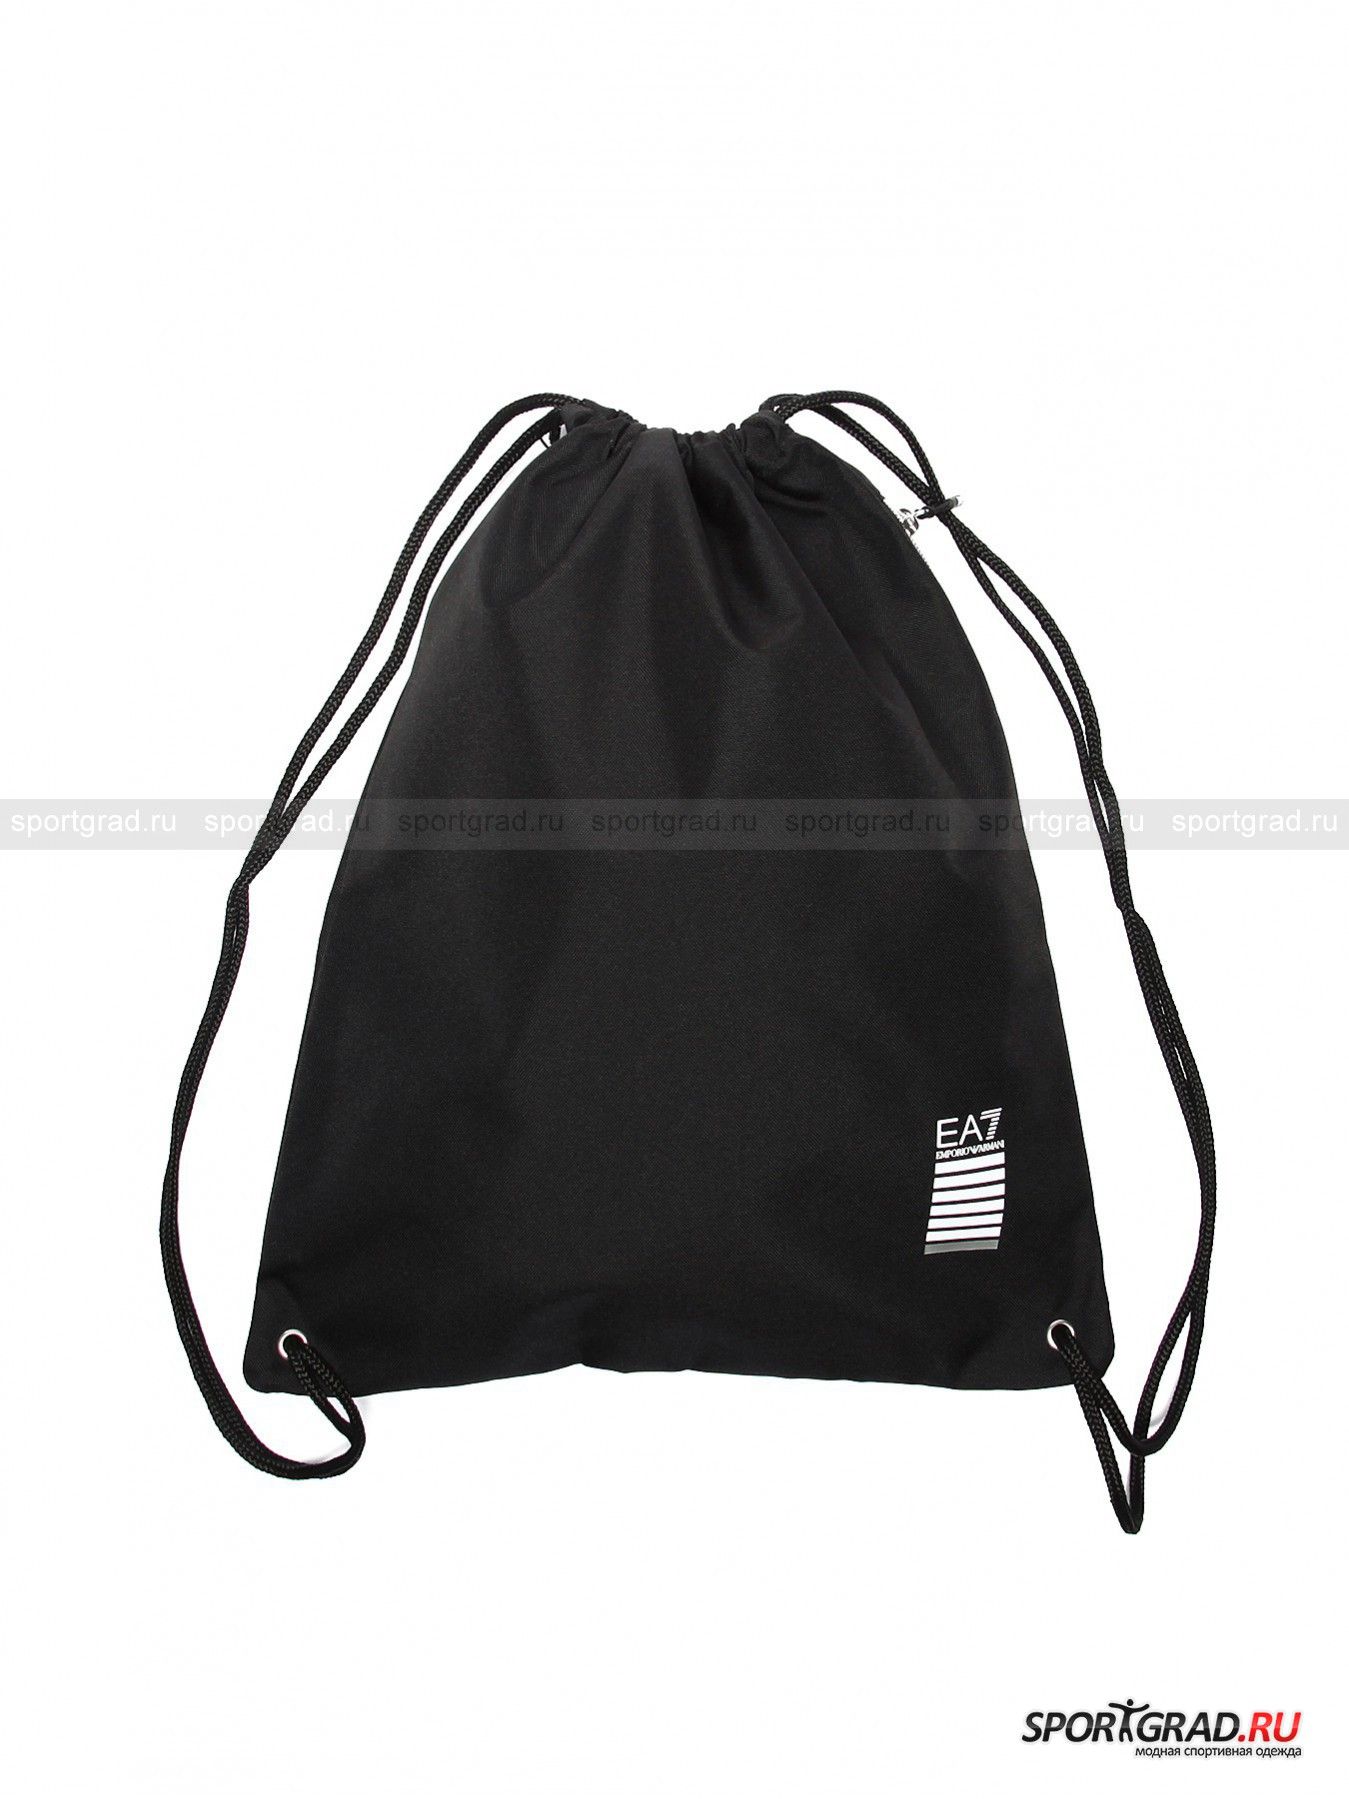 Сумка-мешок Core ID Sack Gym Bag EA7 Emporio Armani от Спортград